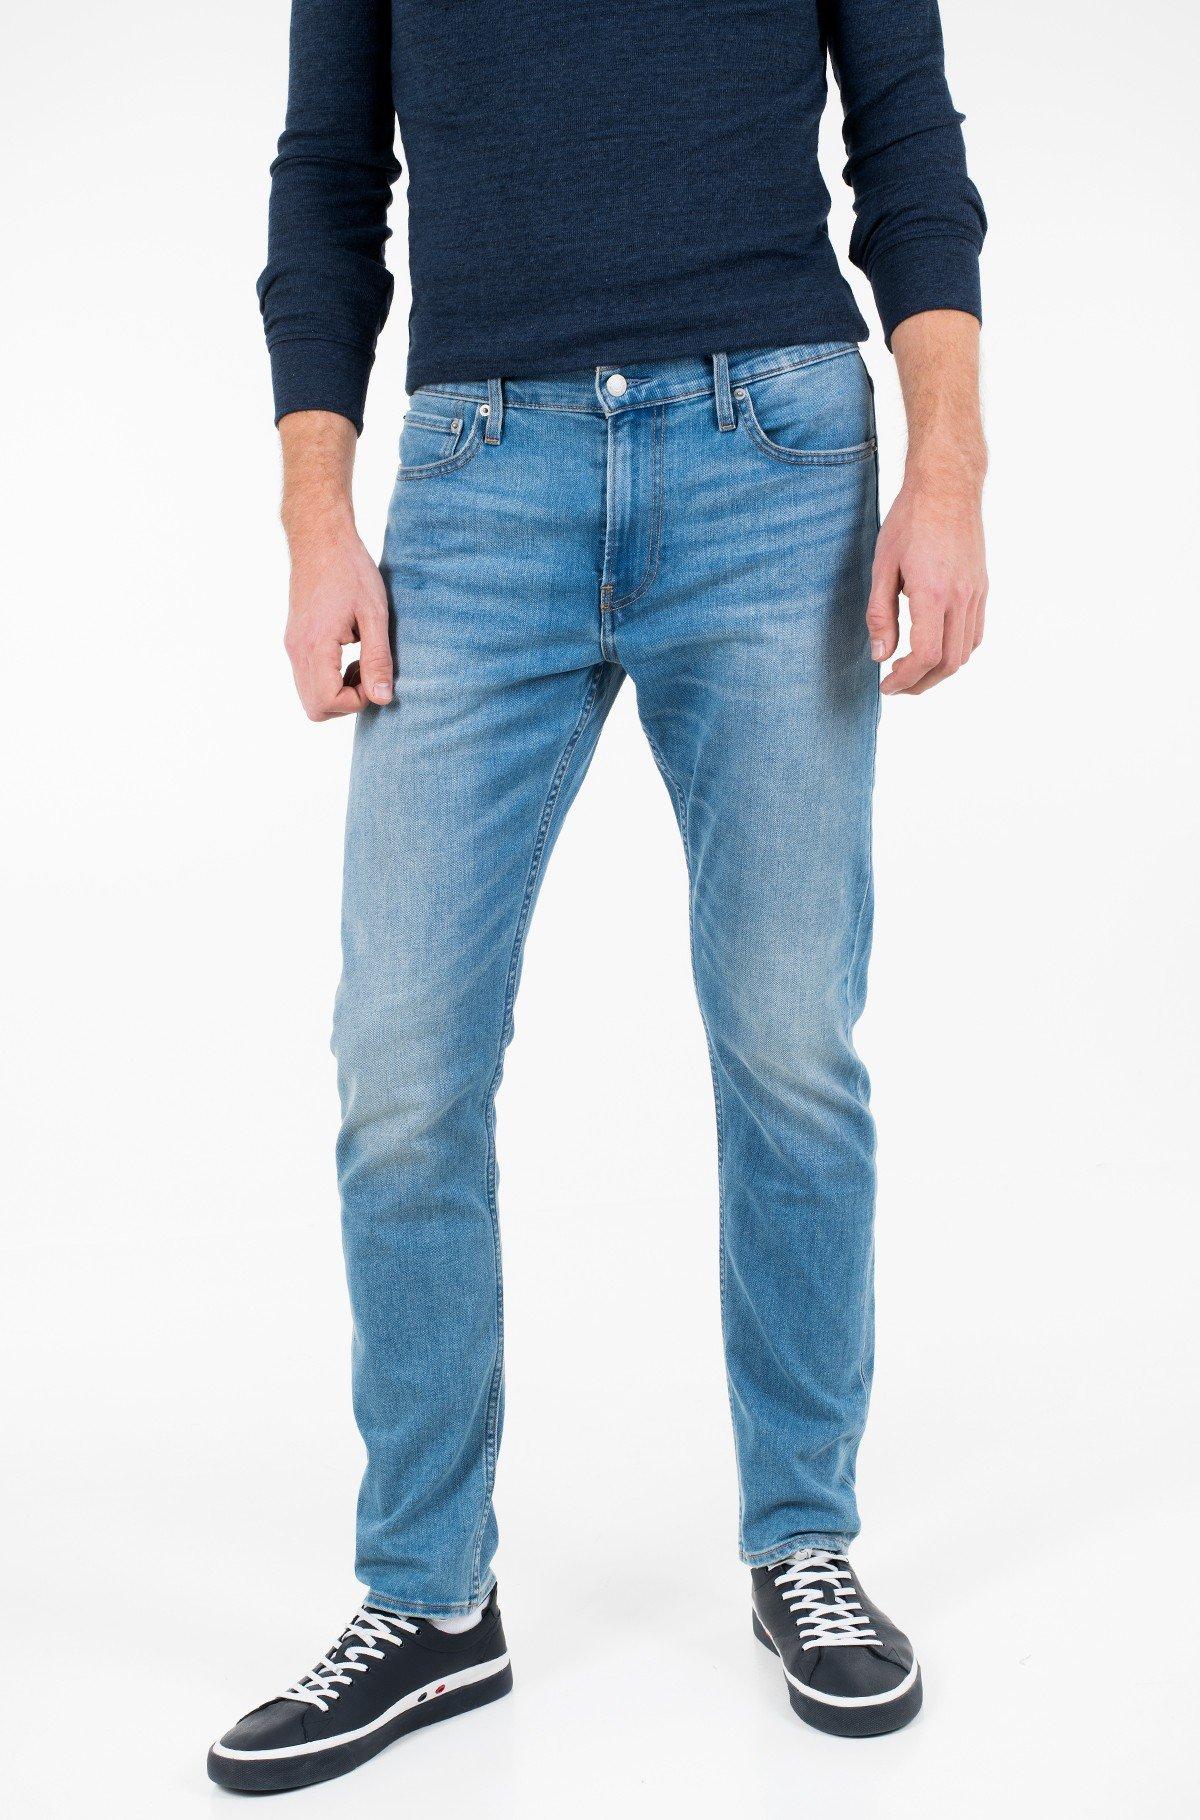 Jeans CKJ 026 SLIM-full-3